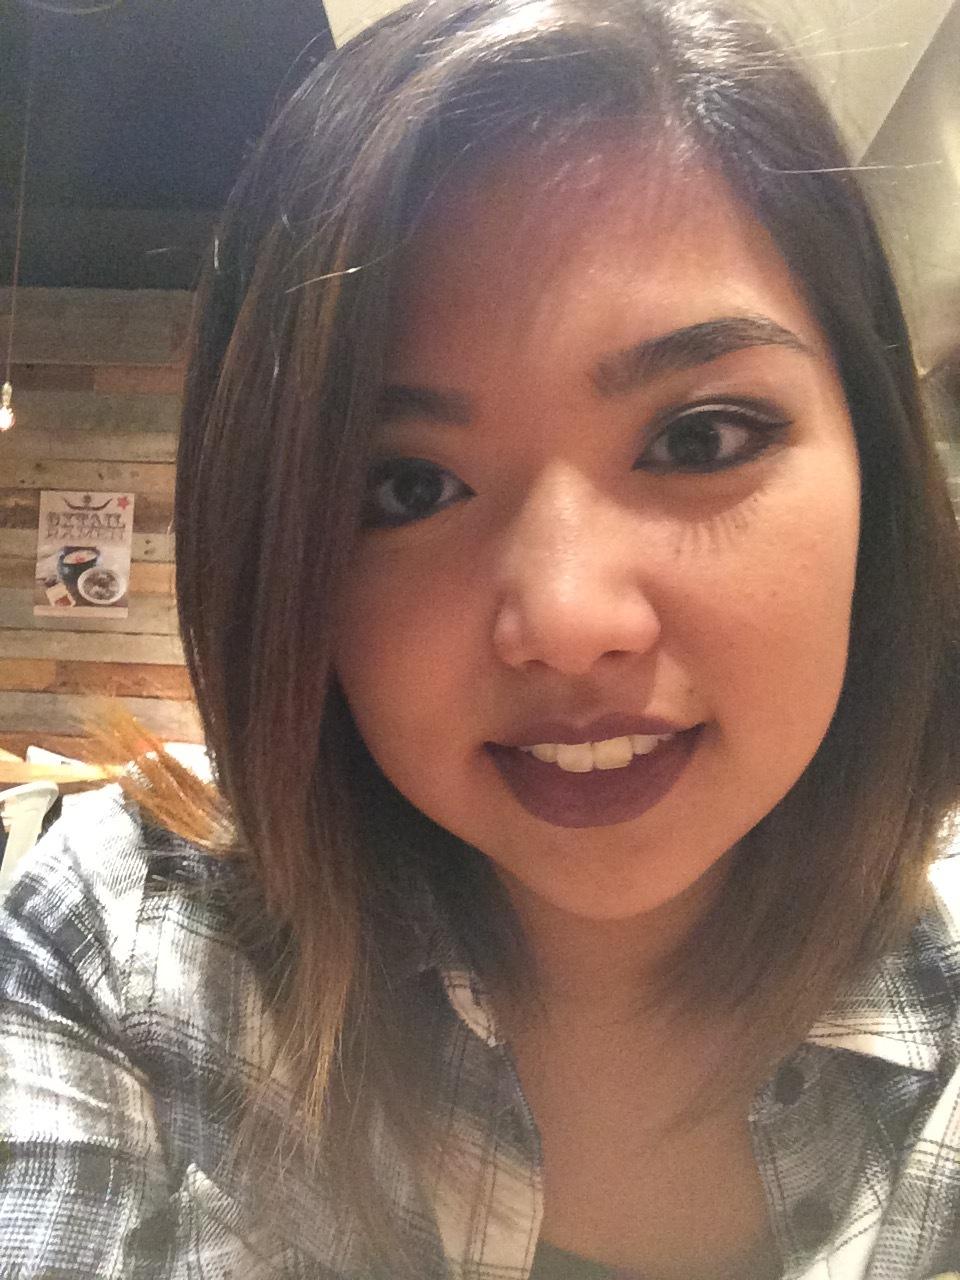 Maryann H: @marrmarr3 Temple University, Class of 2017